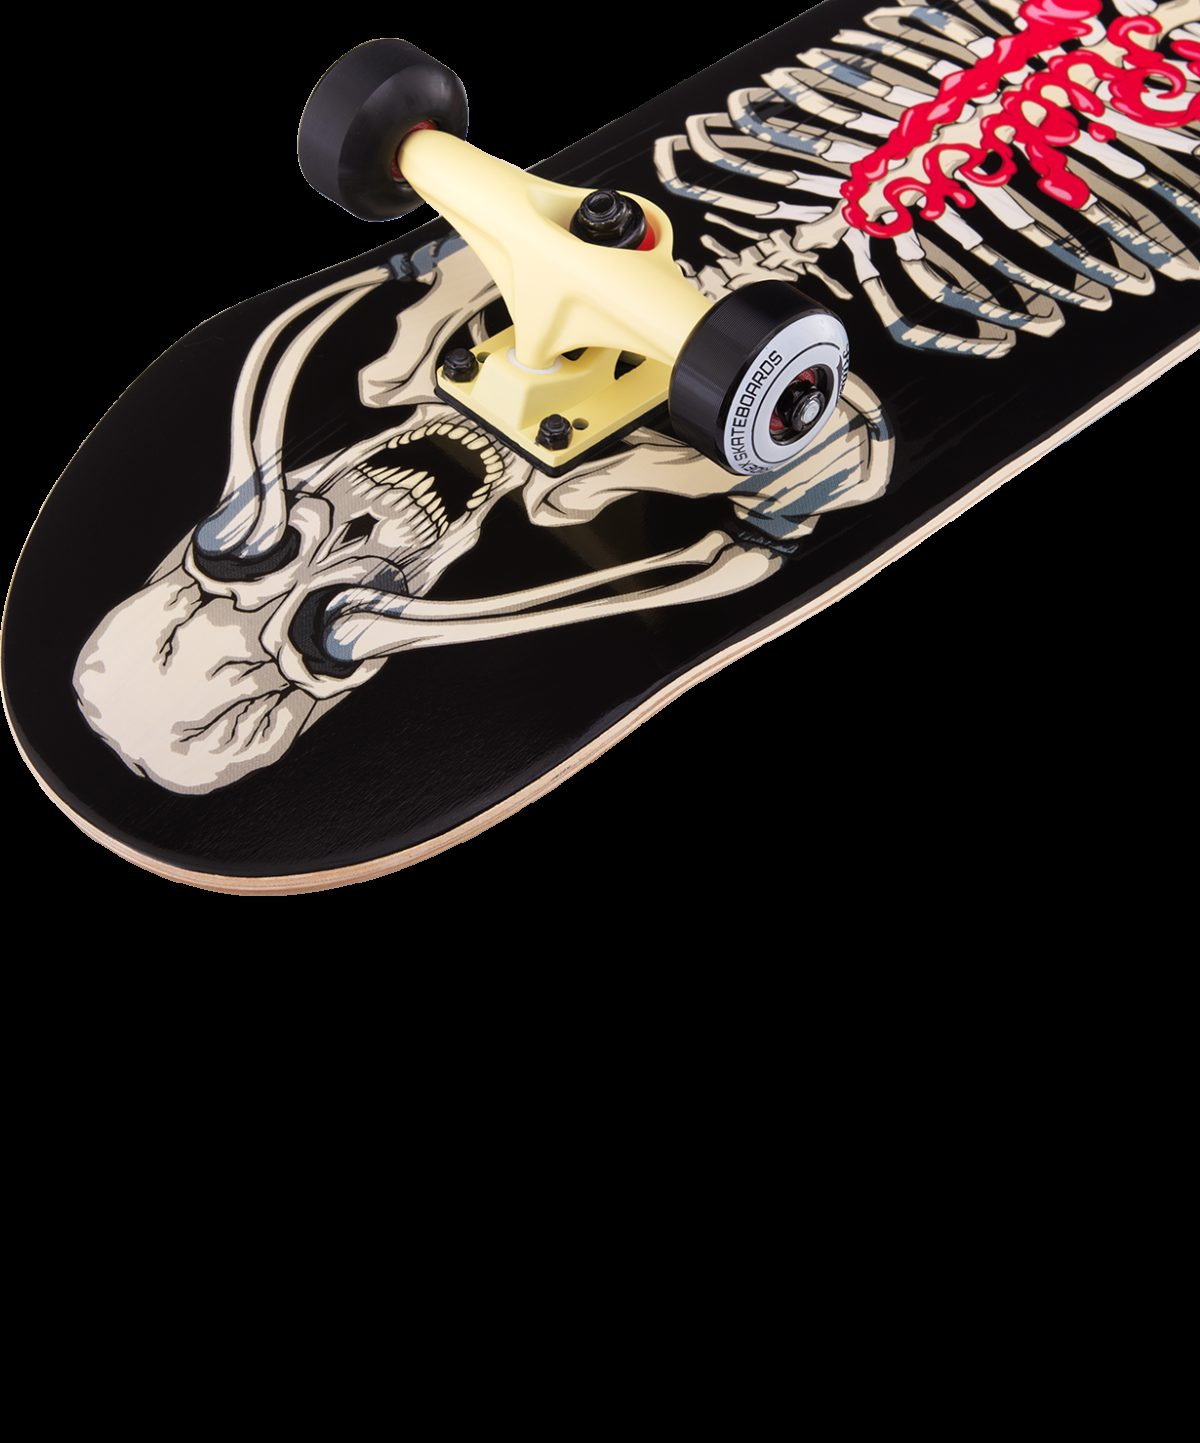 RIDEX скейтборд Addict - 3